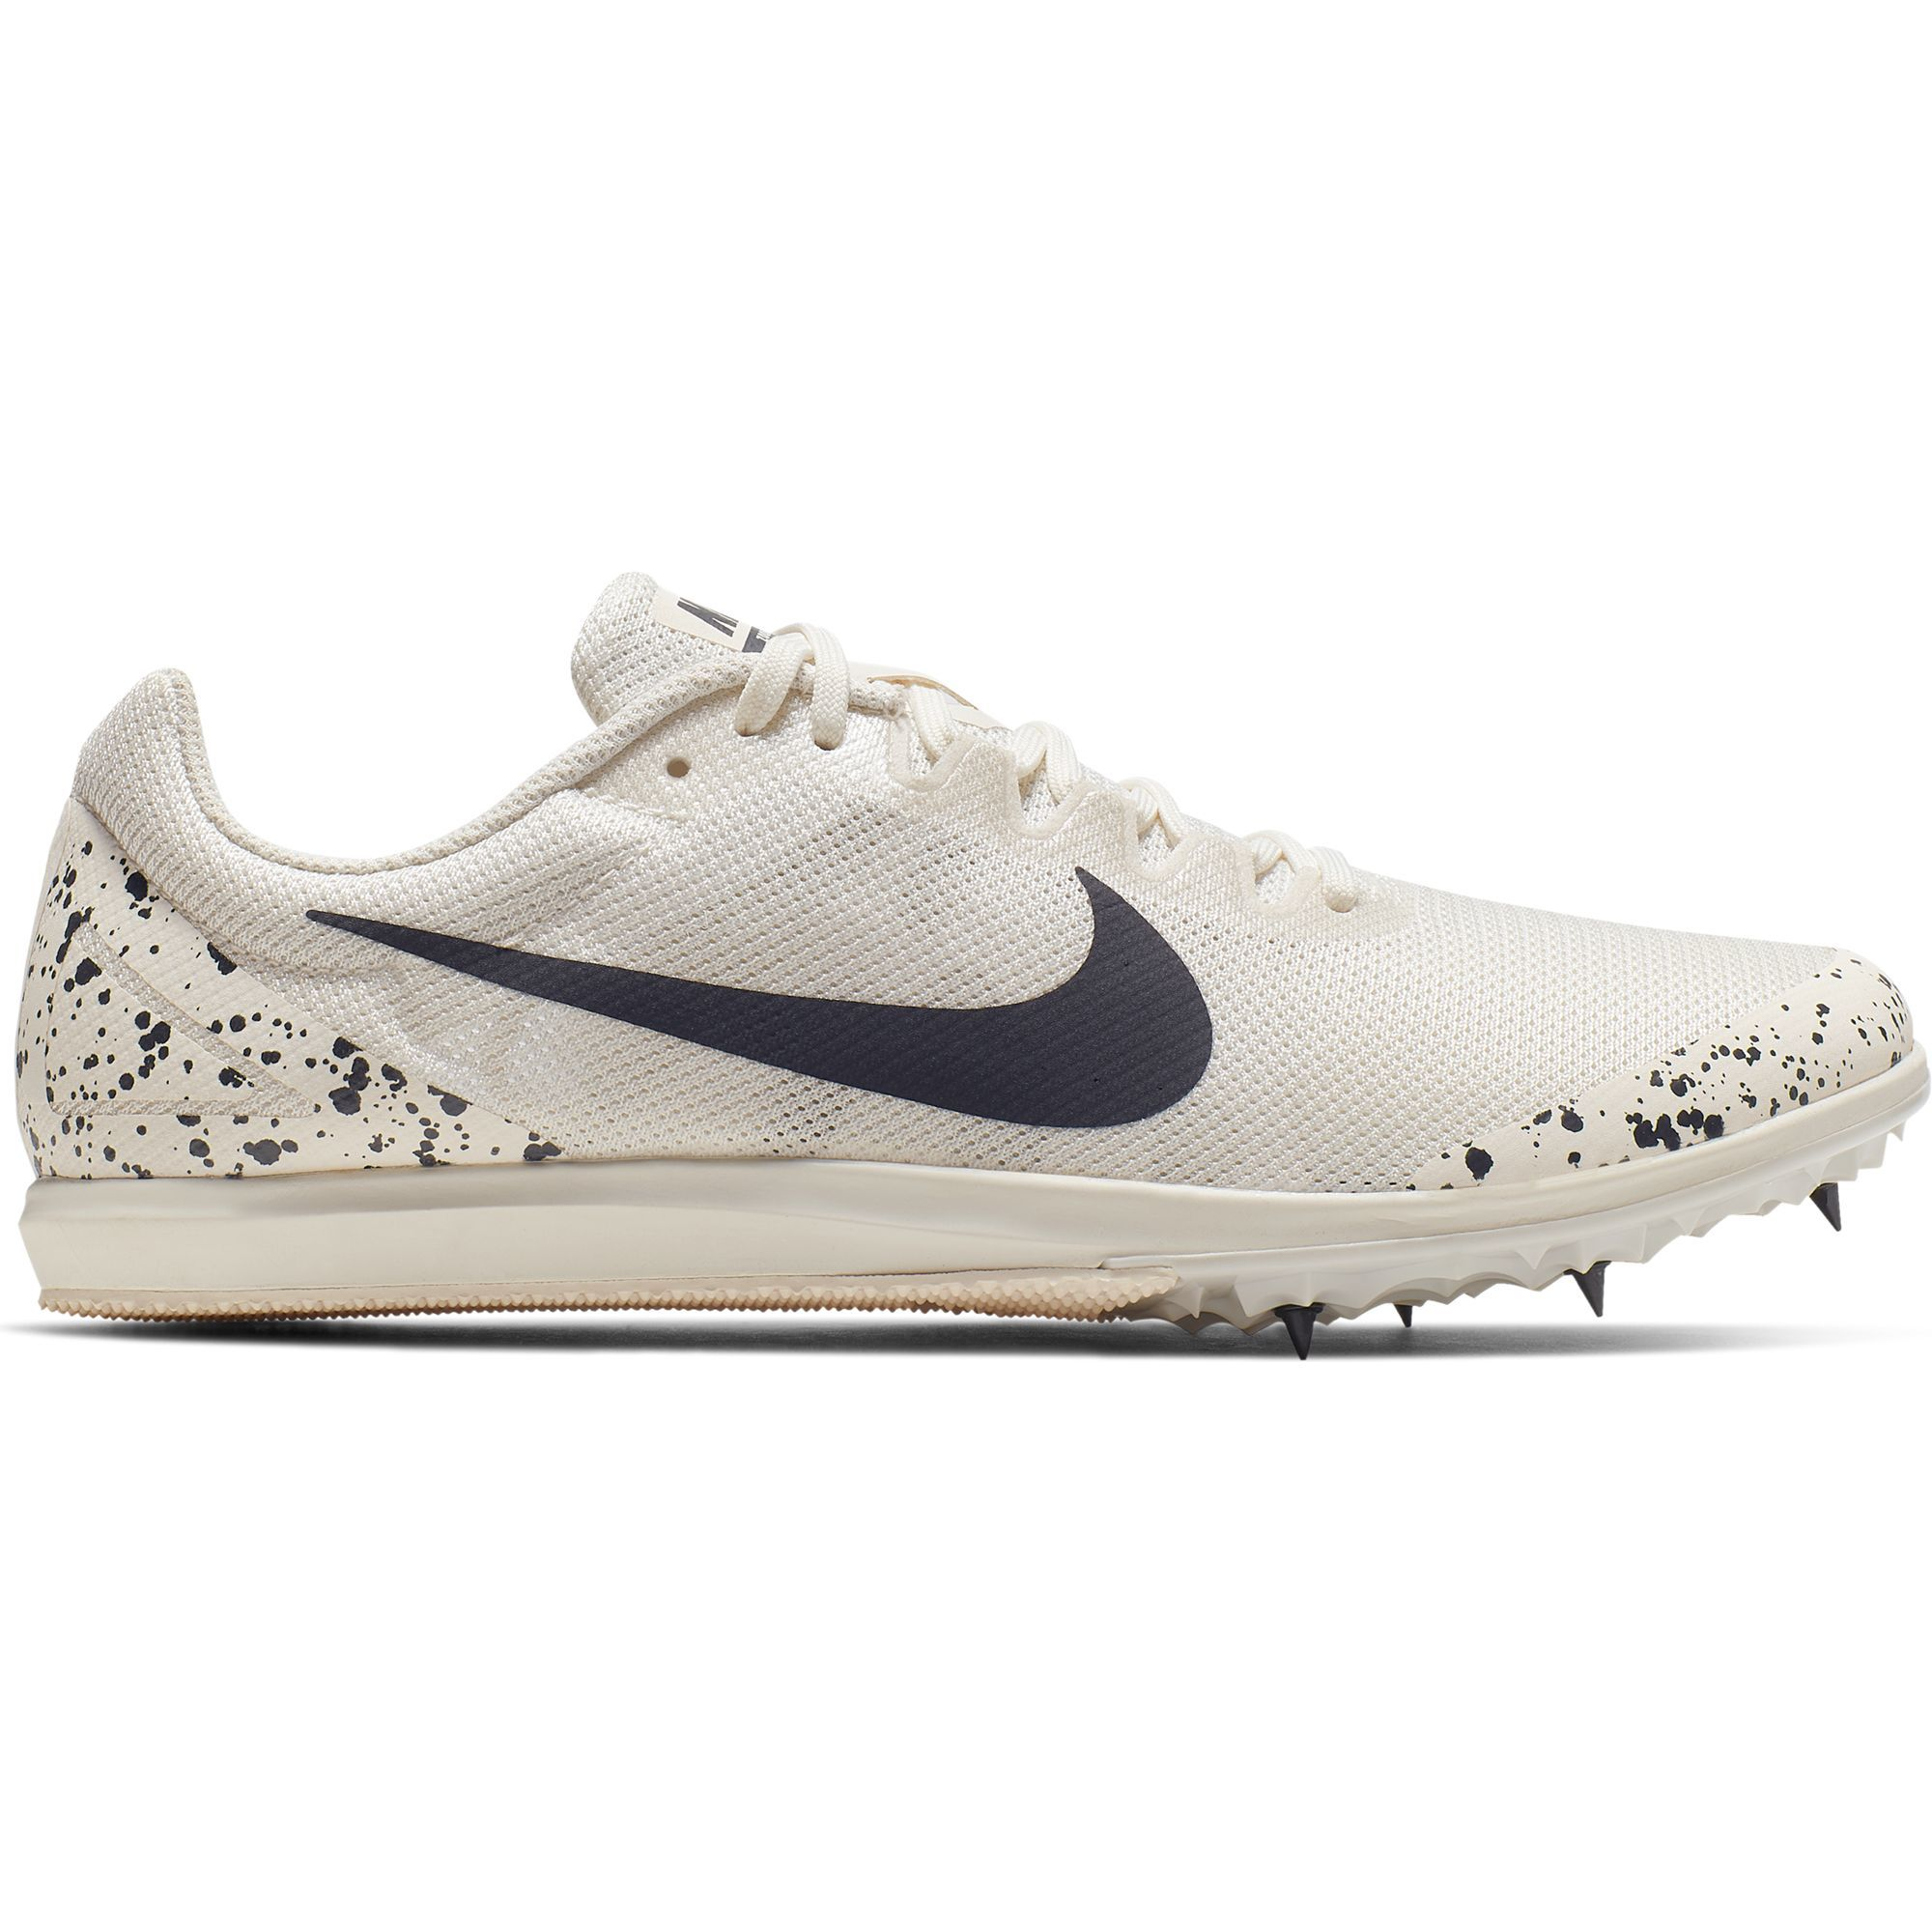 Nike Zoom Rival D 10 in Weiß Grau